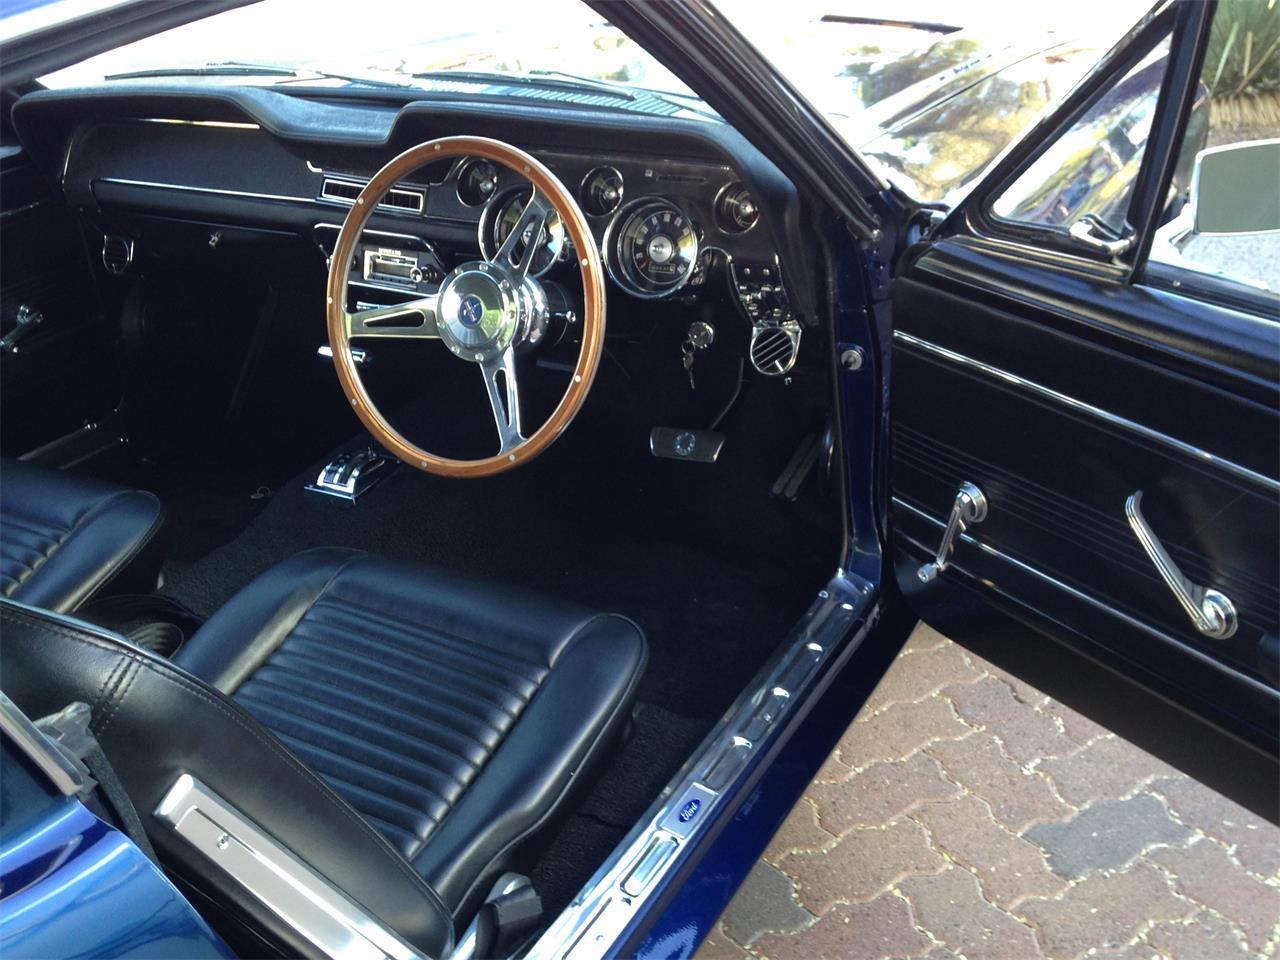 Ford Mustang 1967 Rhd